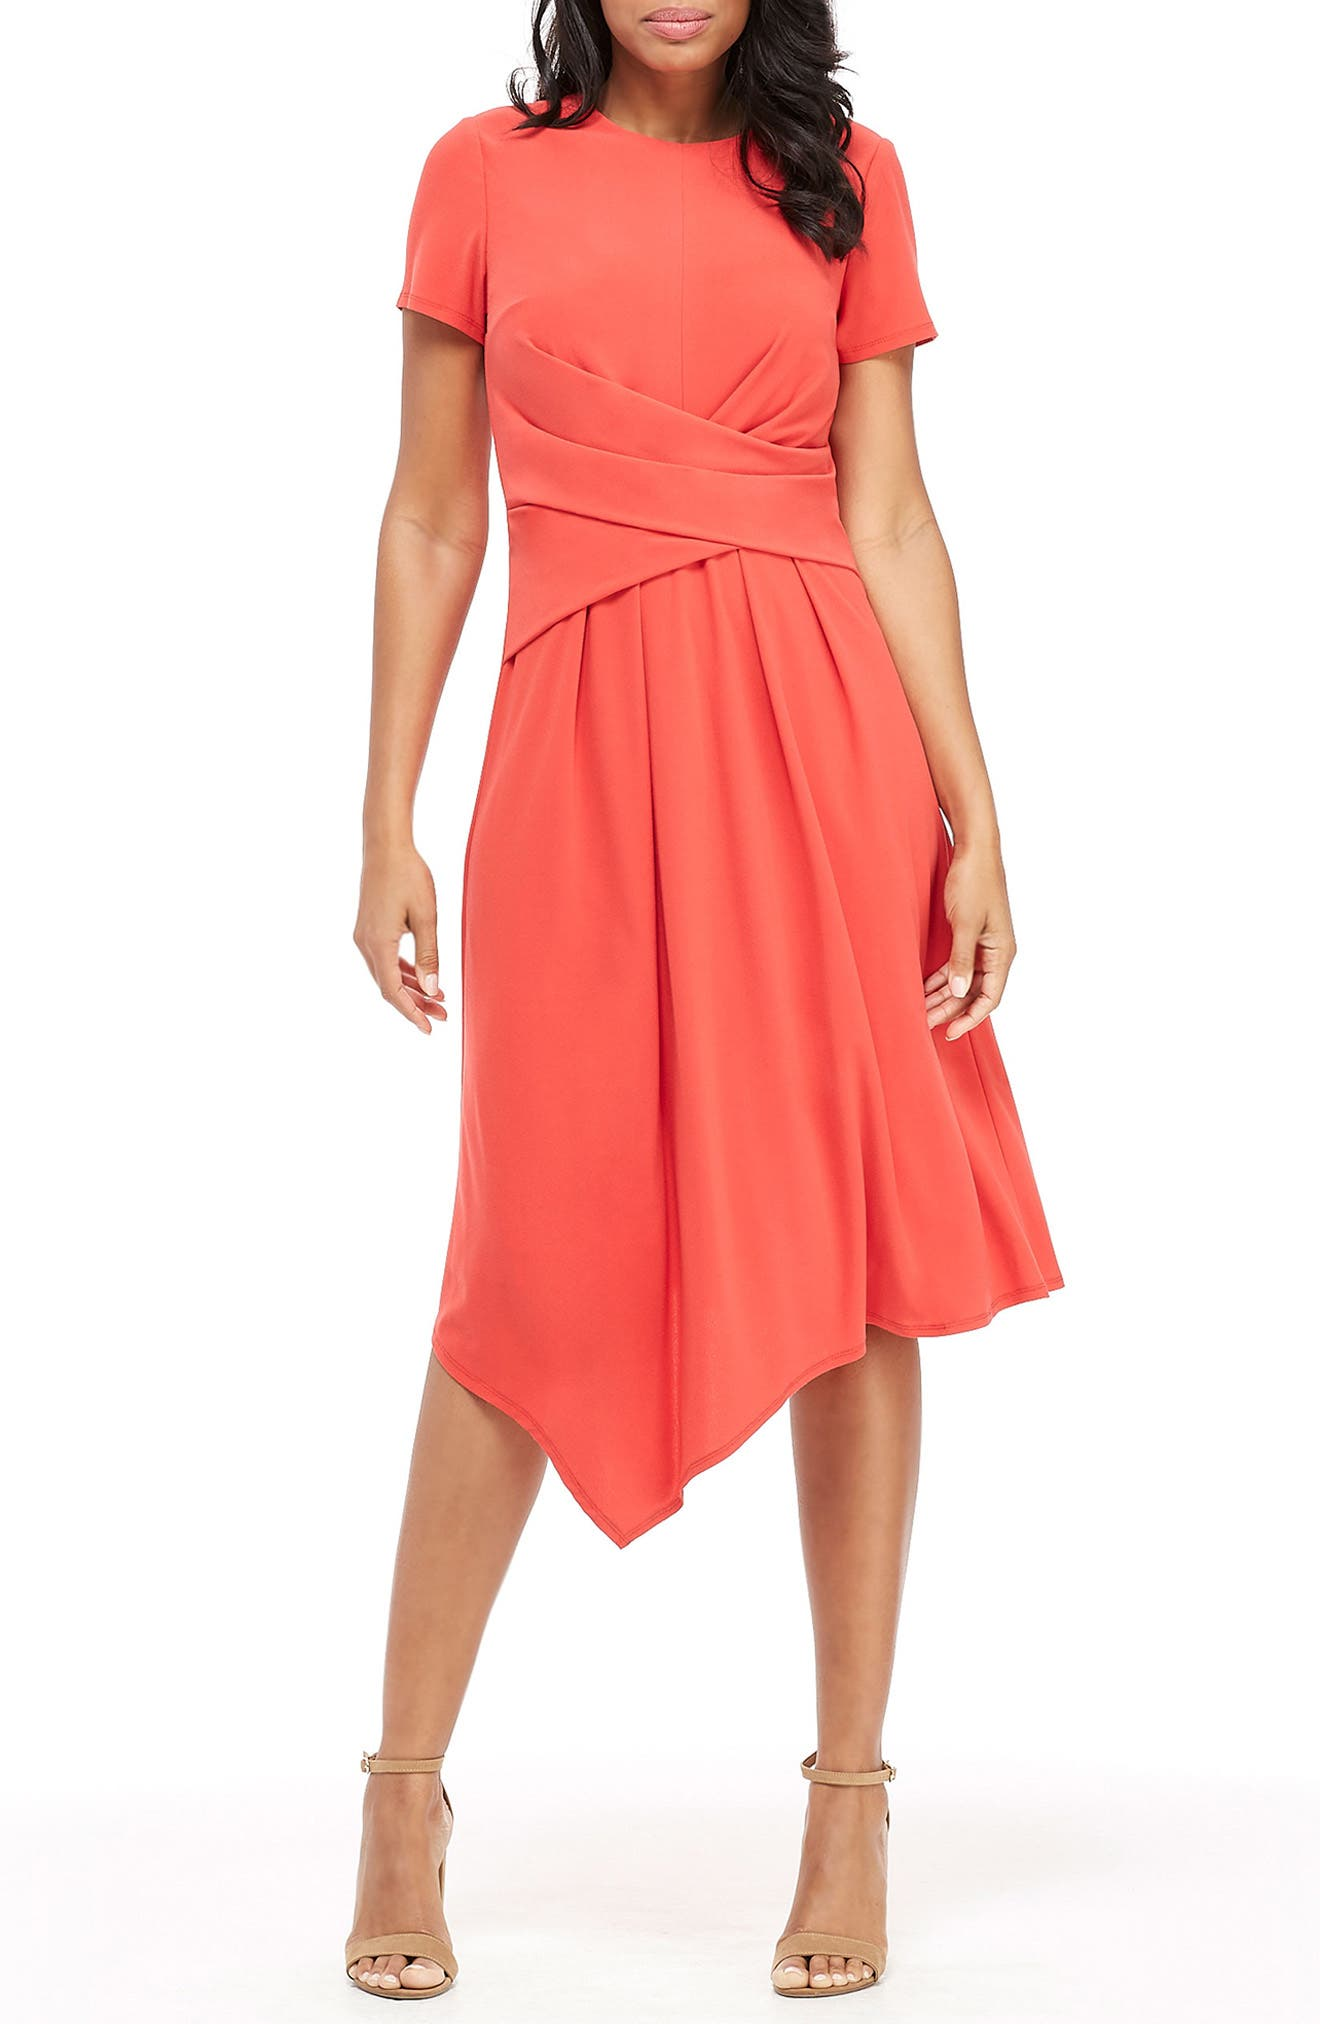 MAGGY LONDON, Draped Asymmetrical Dress, Main thumbnail 1, color, FIESTA RED